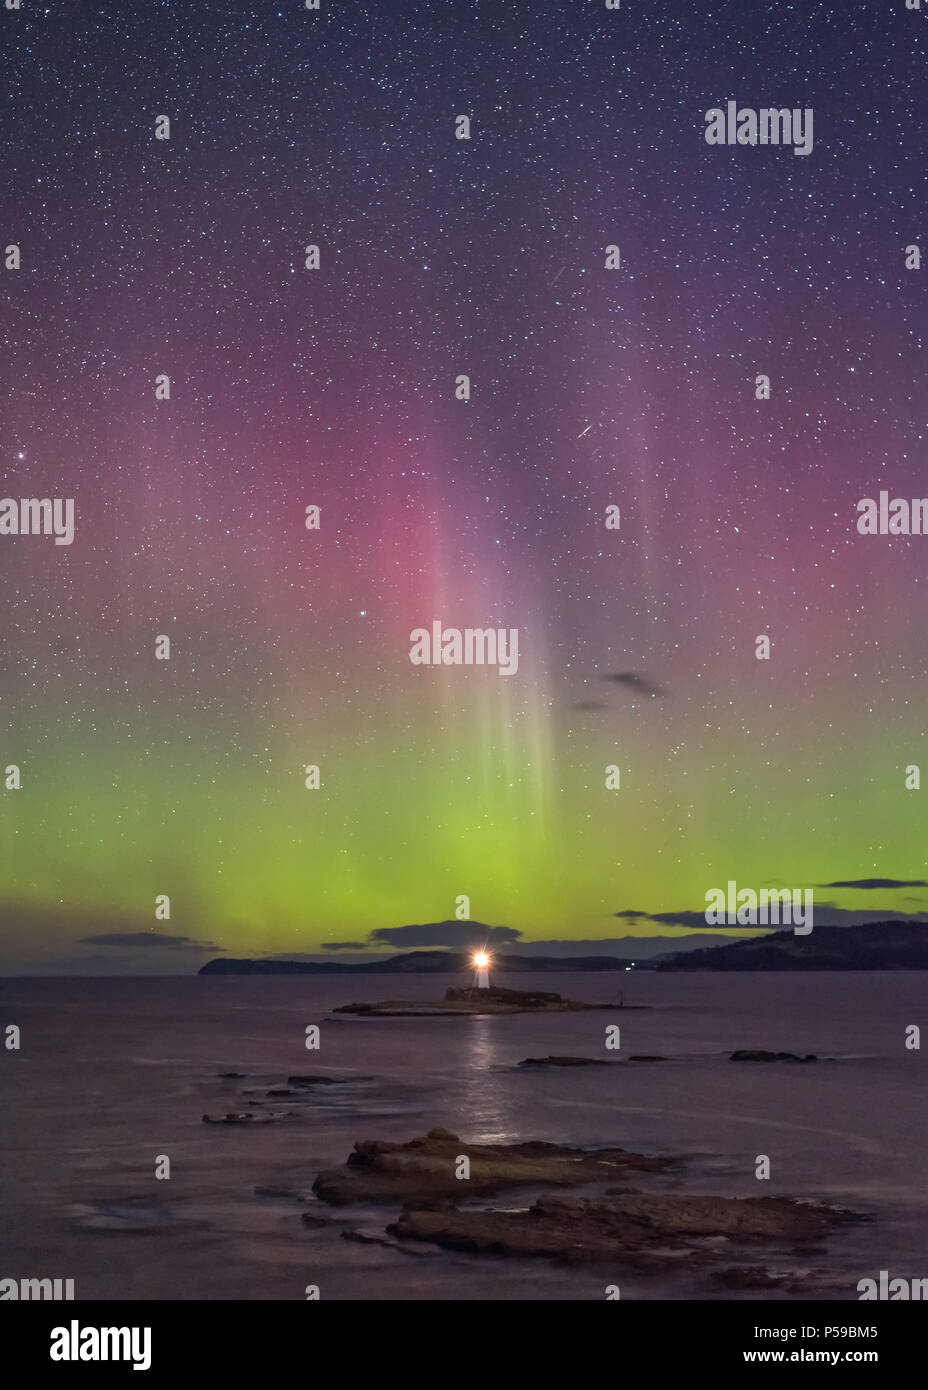 Aurora Australis over the Iron Pot Lighthouse - Stock Image